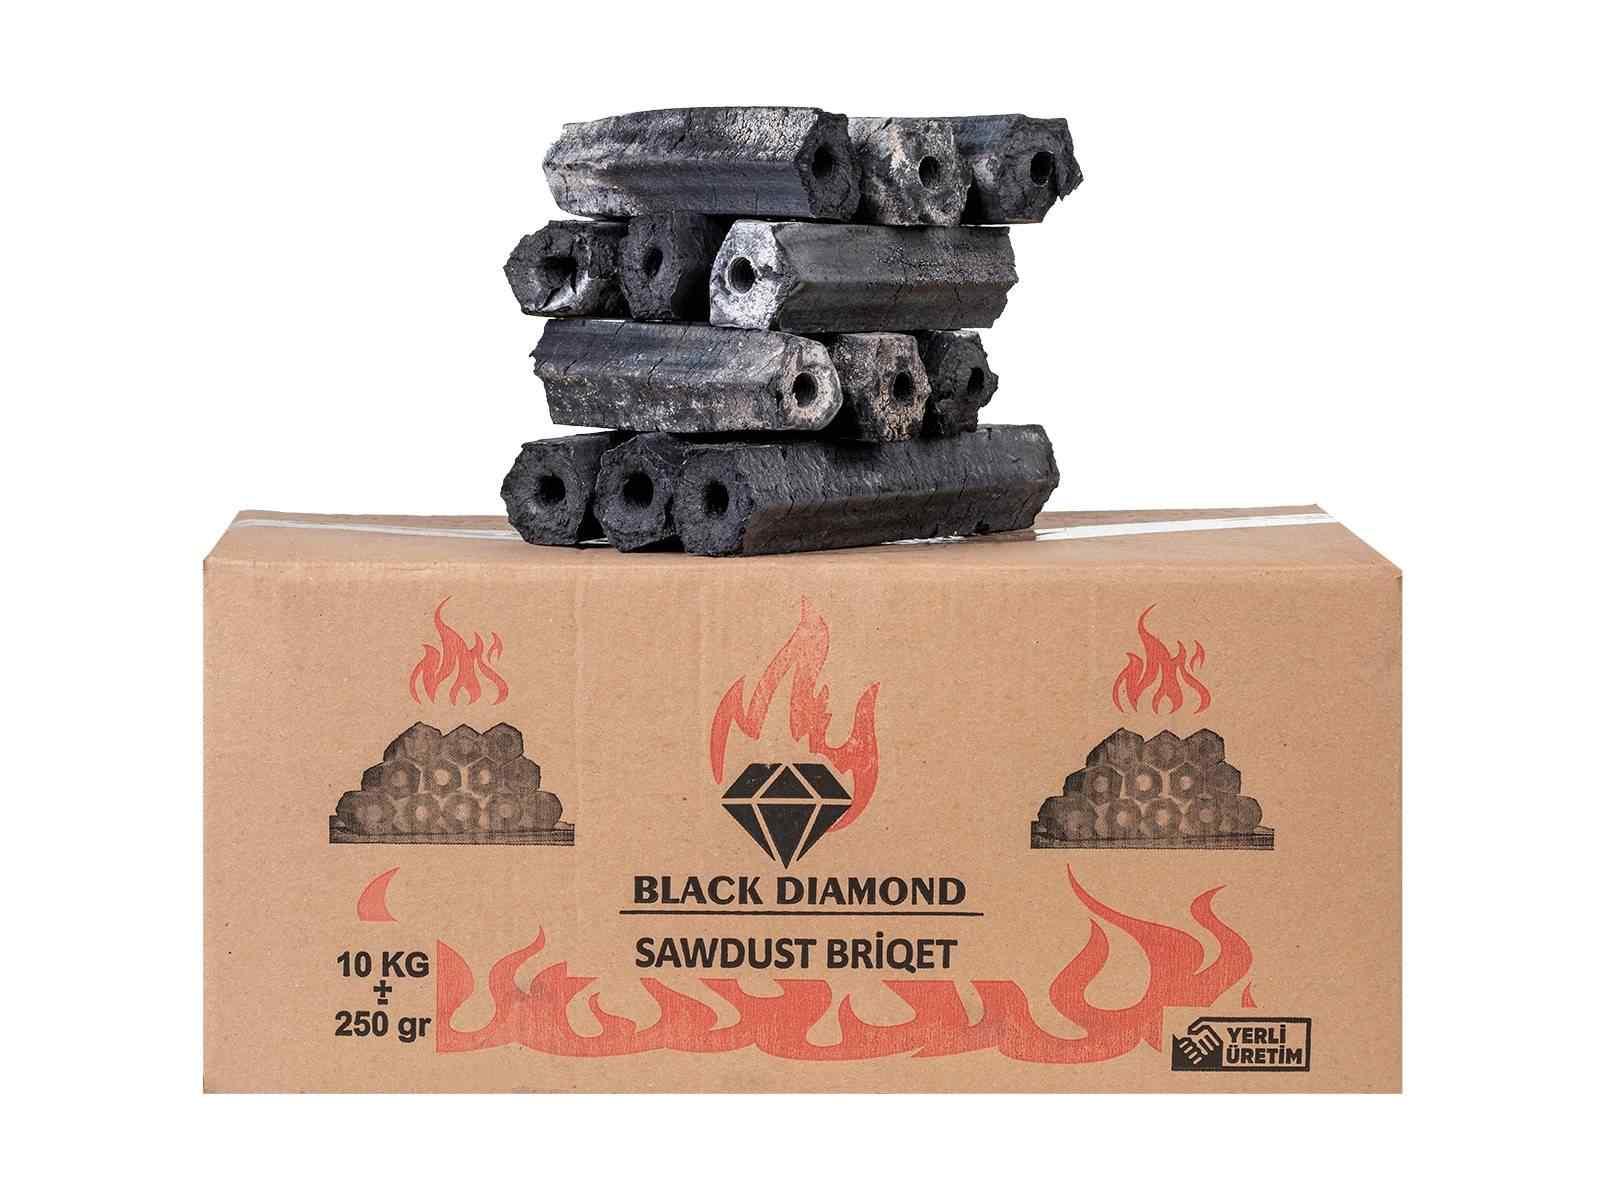 BLACK DIAMOND PRESS BRİKET TAŞ FIRIN MANGAL KÖMÜRÜ 10kg